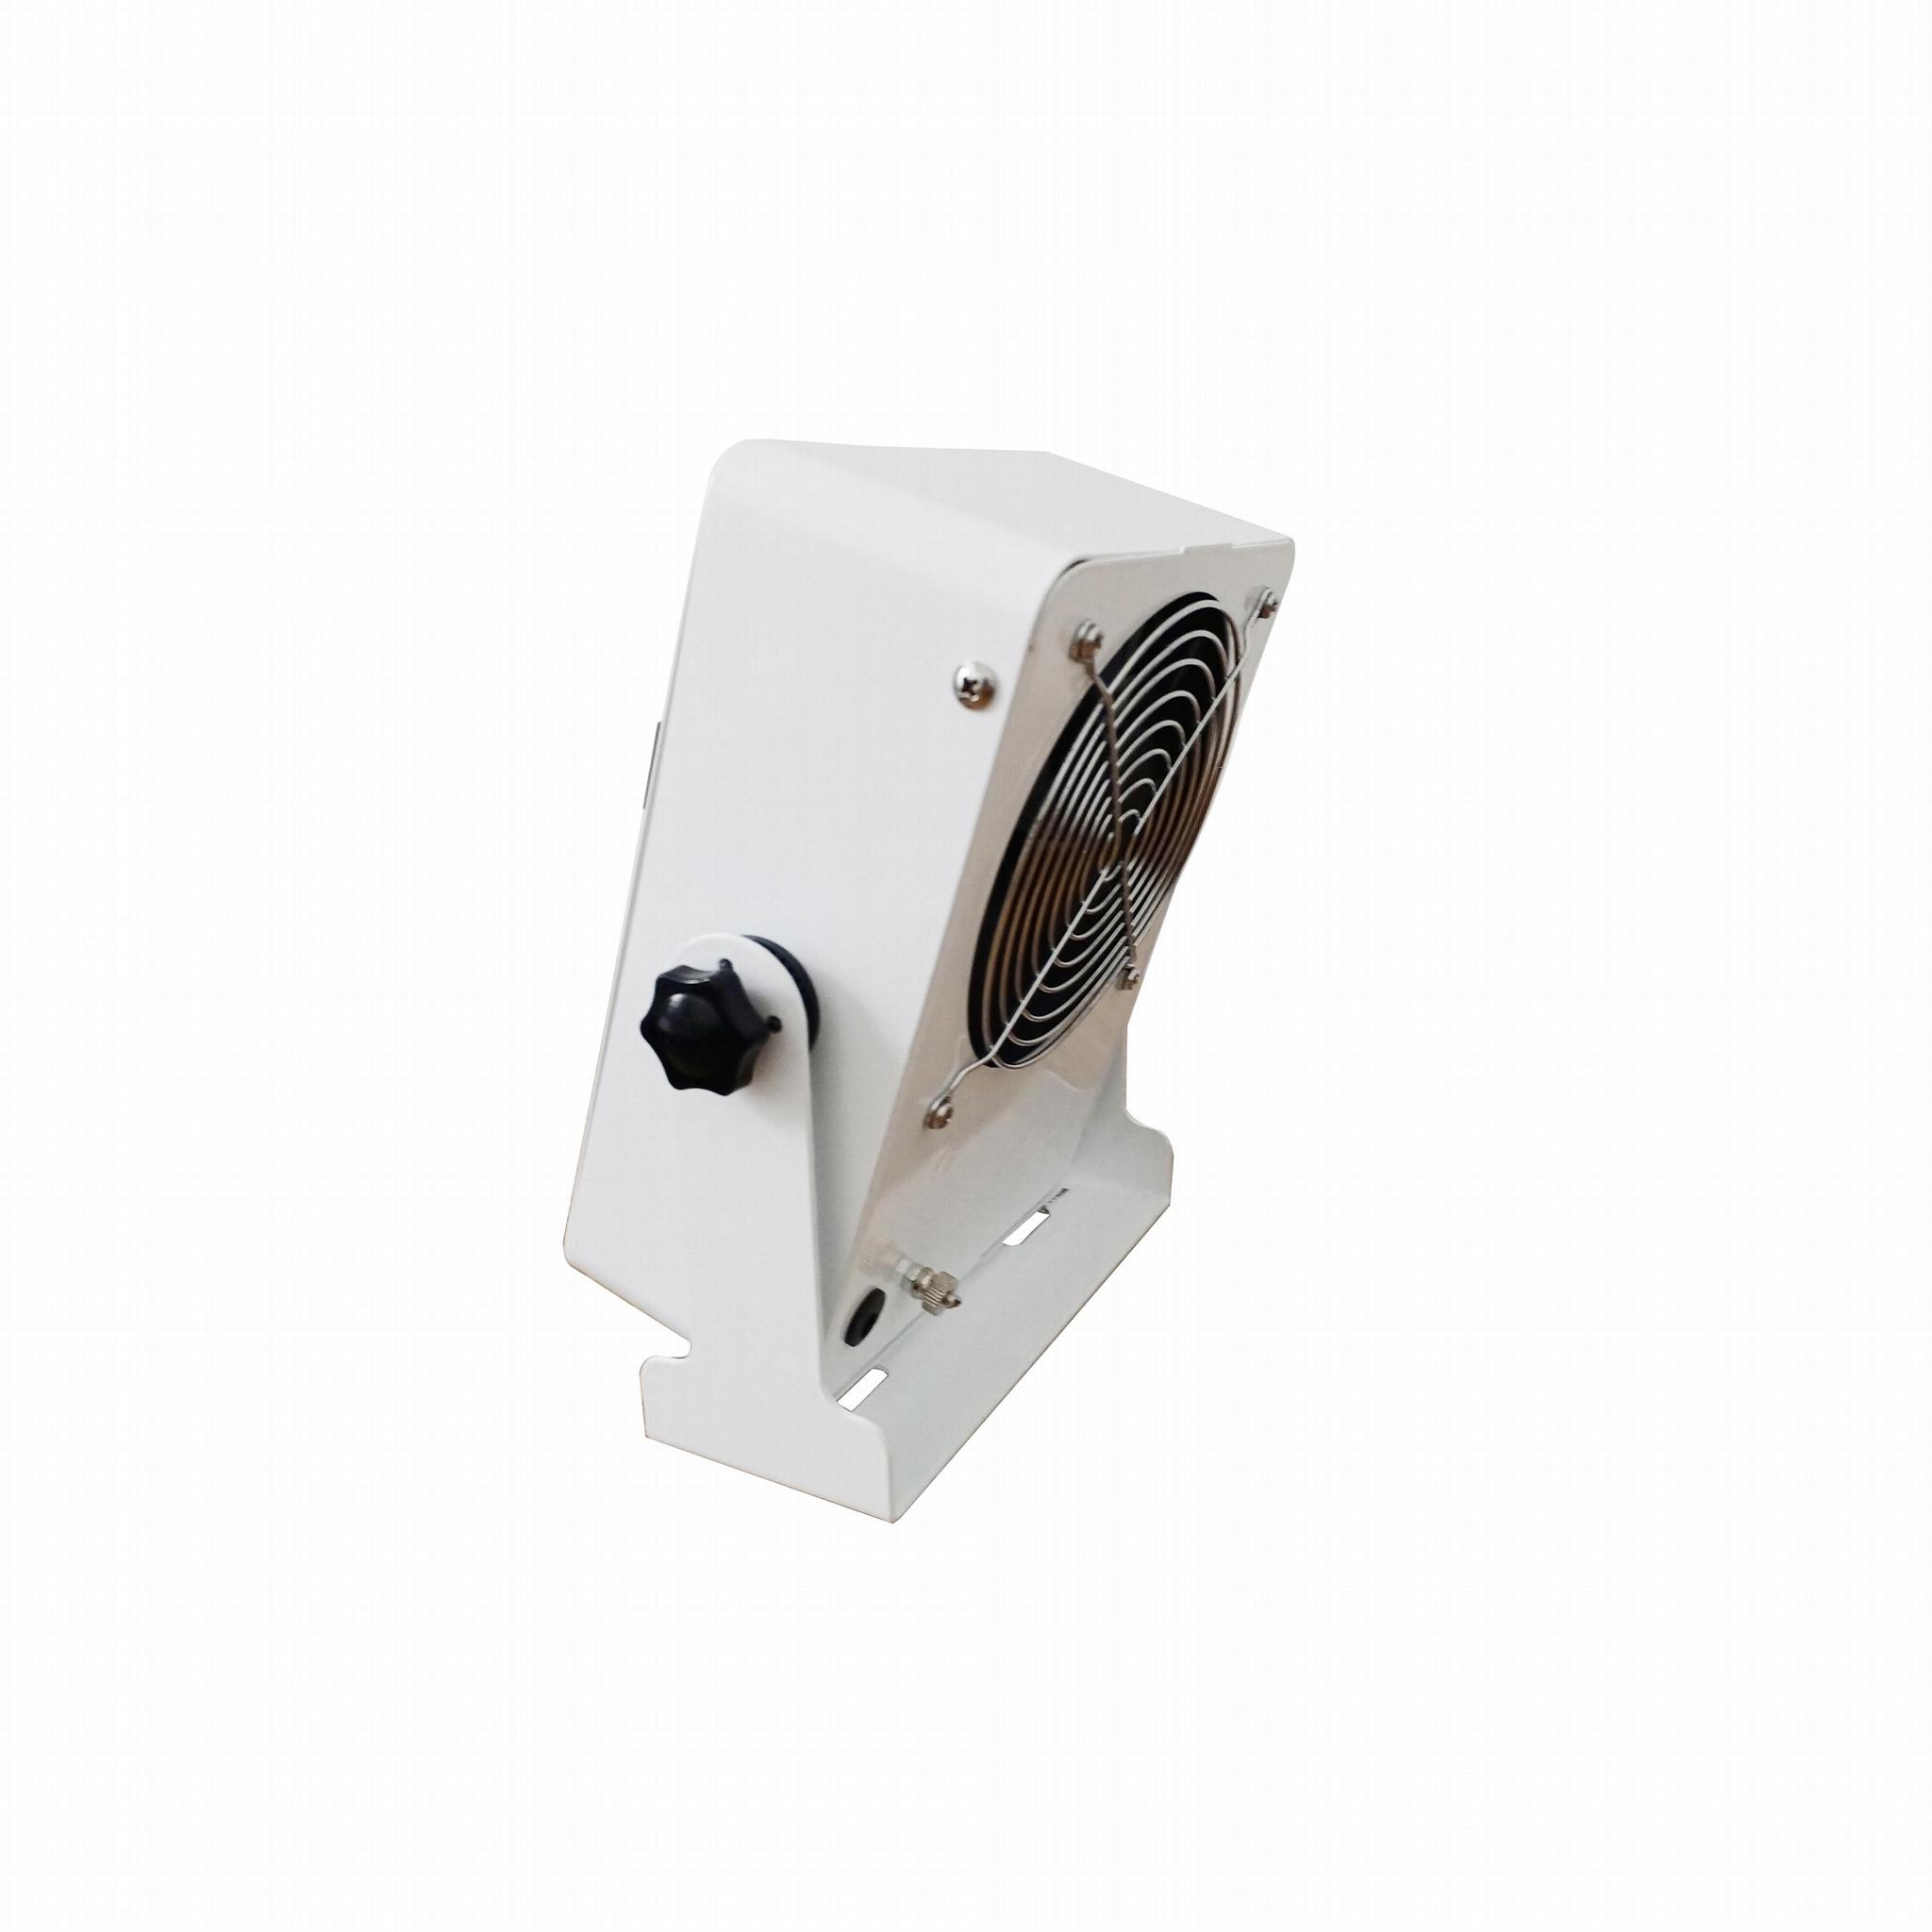 NEW Remote Control smart auto clean ion balance monitor ionizer blower 4